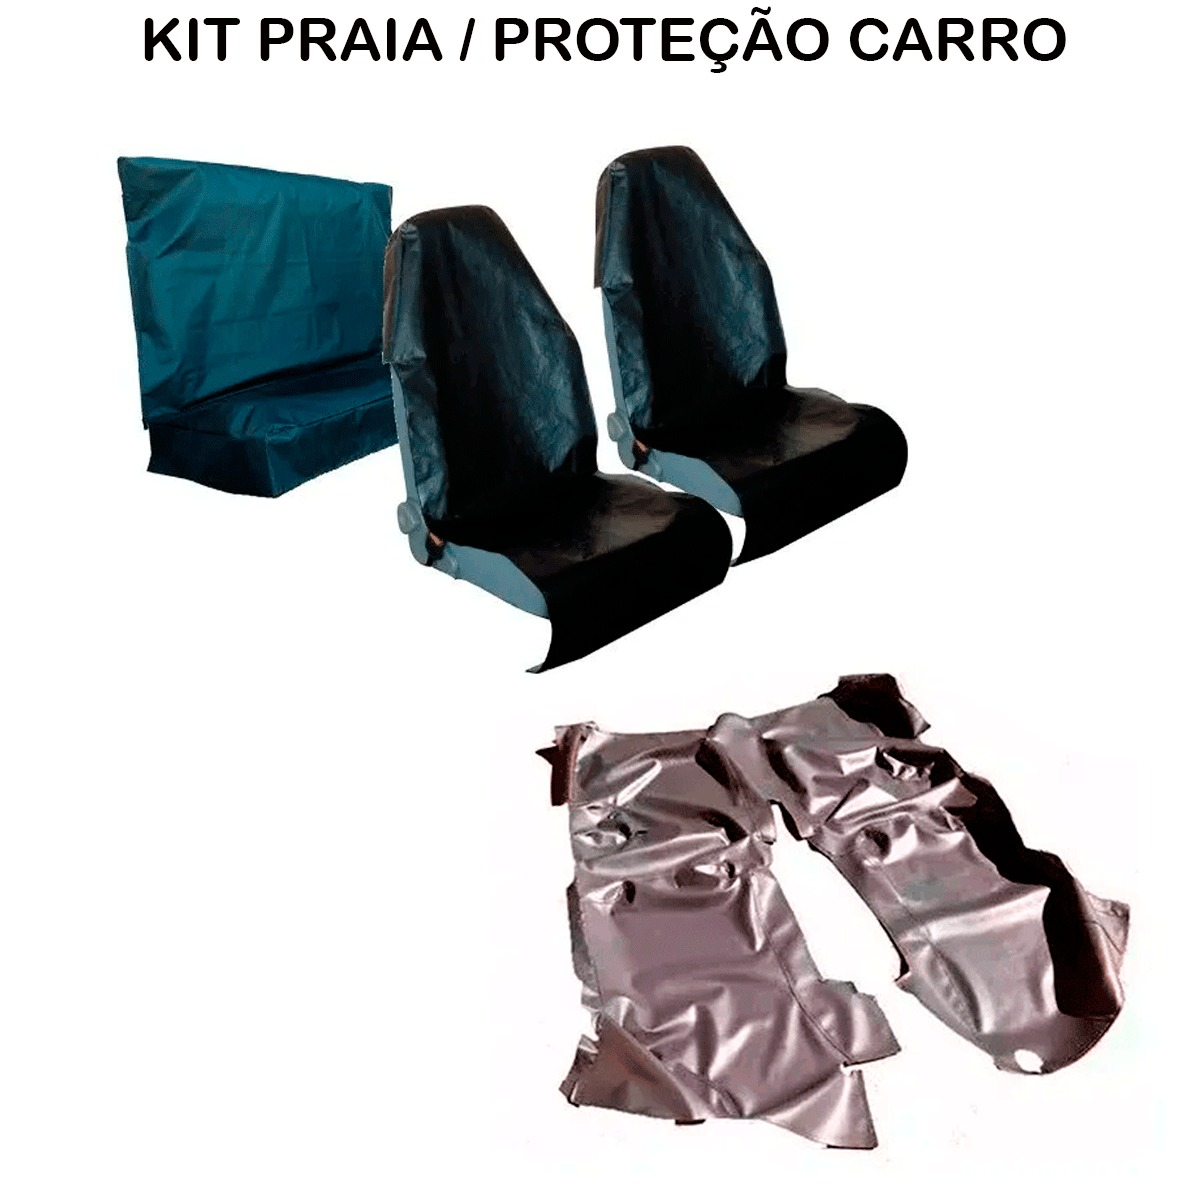 Tapete Em Vinil Volkswagen Gol G4 + Capa Banco Protecao Banco Areia Suor Academia